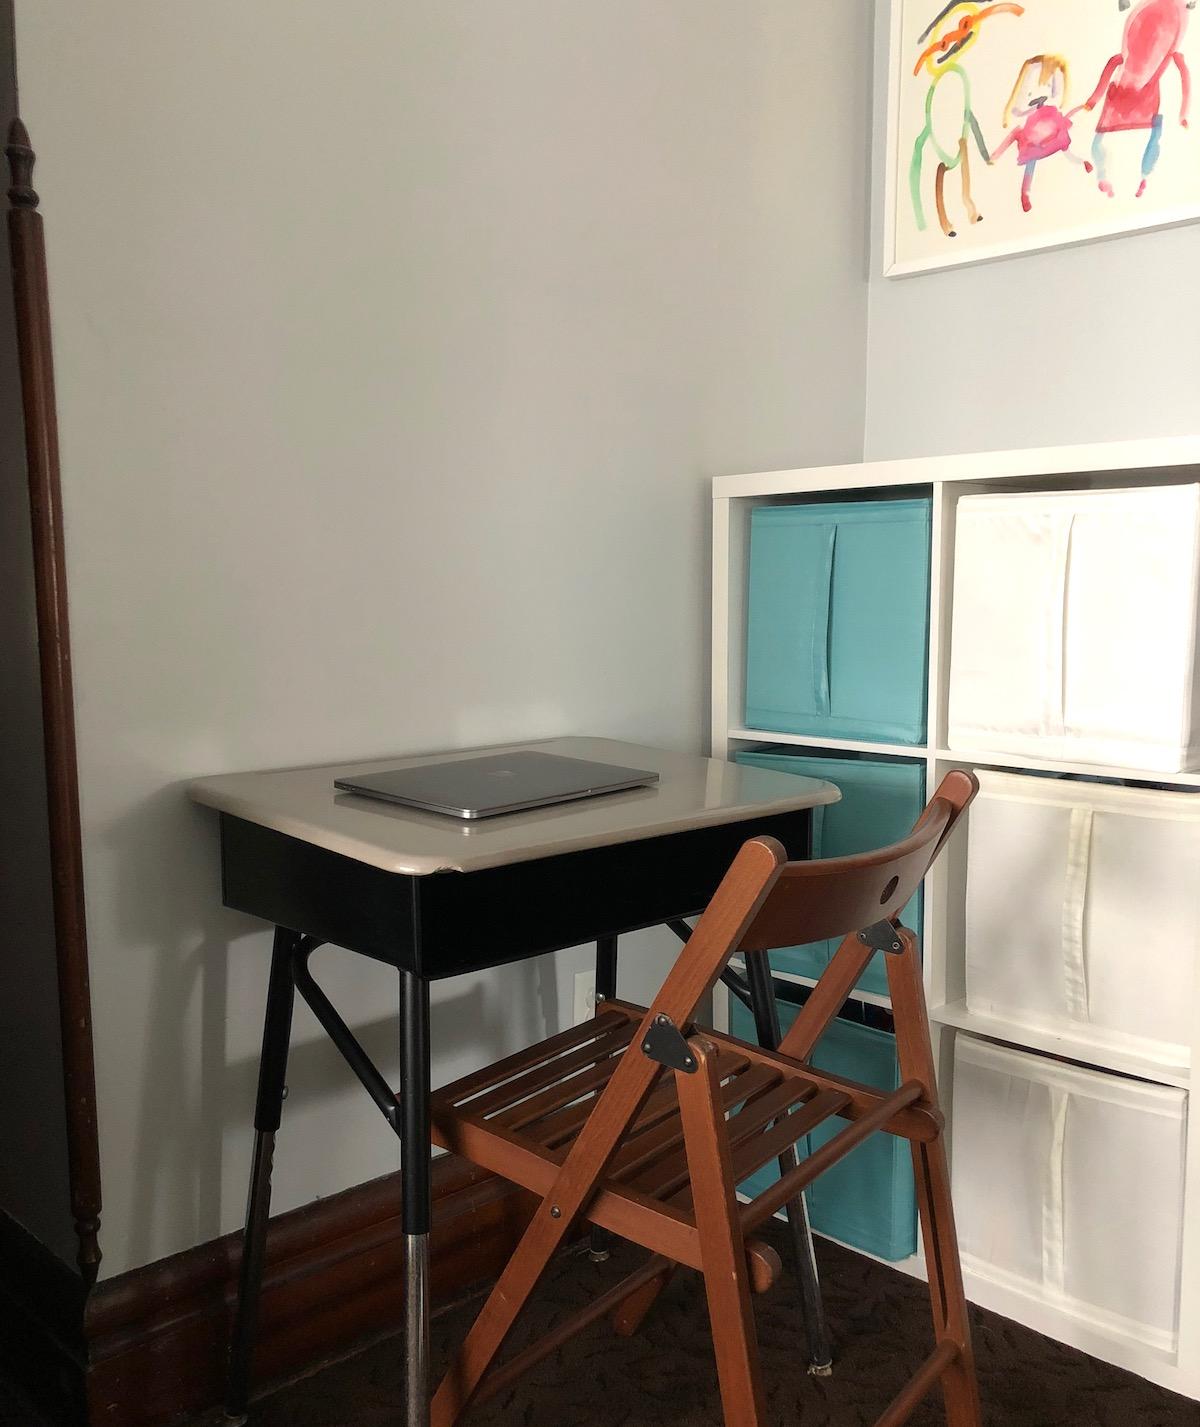 A tiny desk